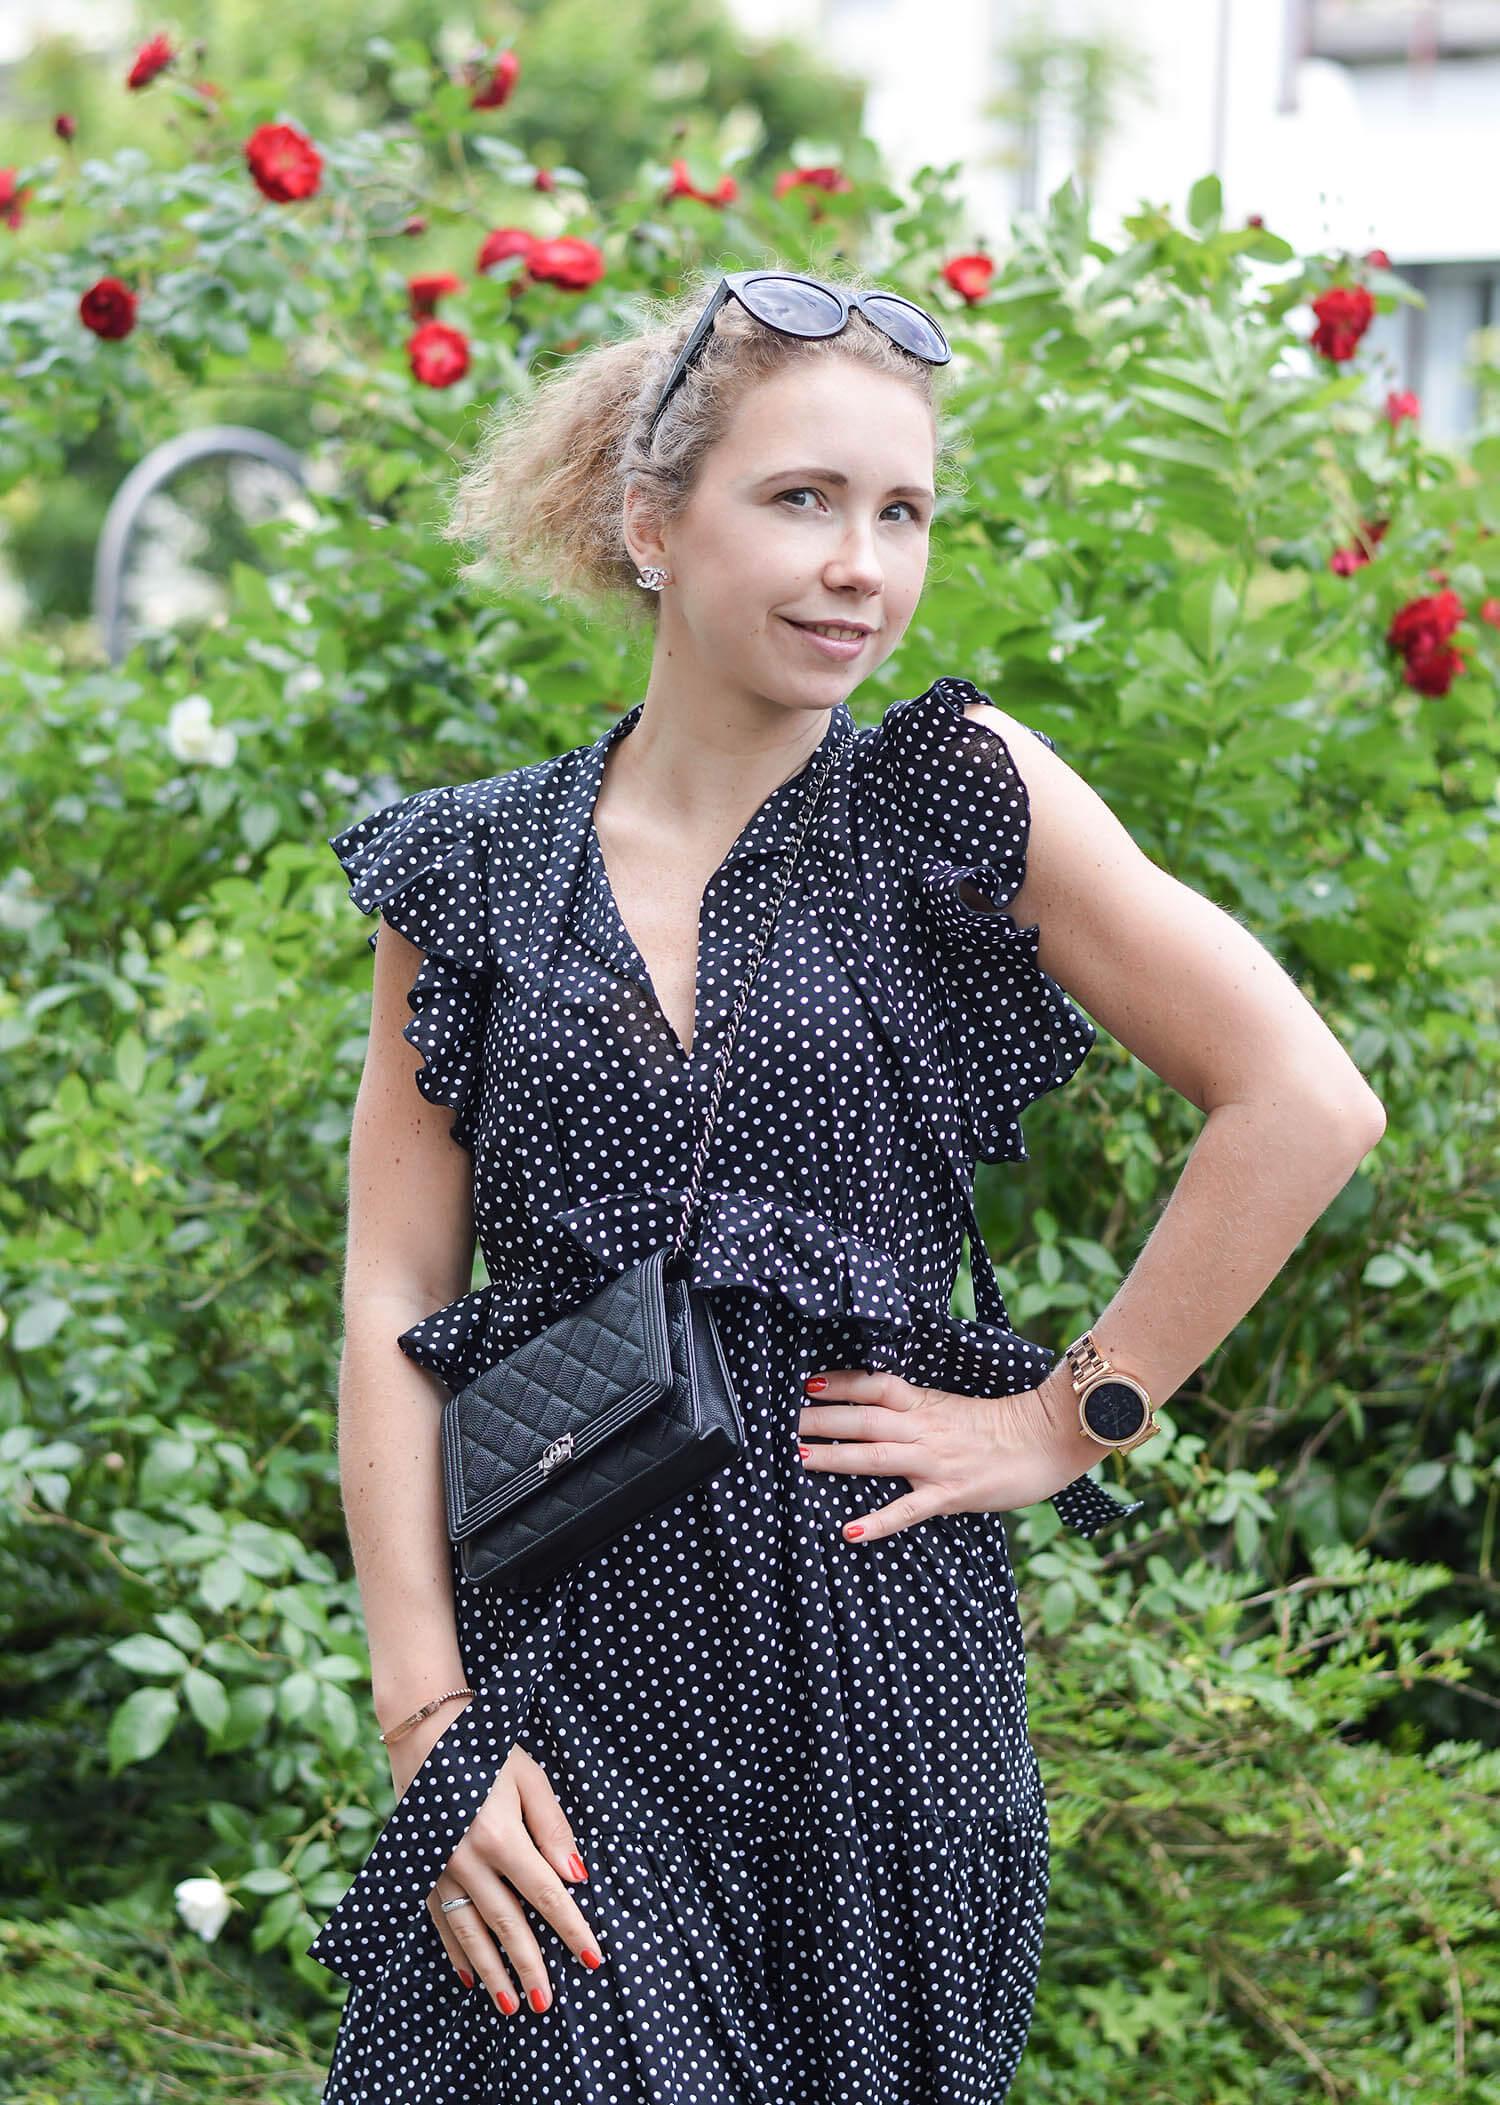 Polka-Dots-Maxidress-Summer-Outfit-Kationette-Fashionblogger-NRW